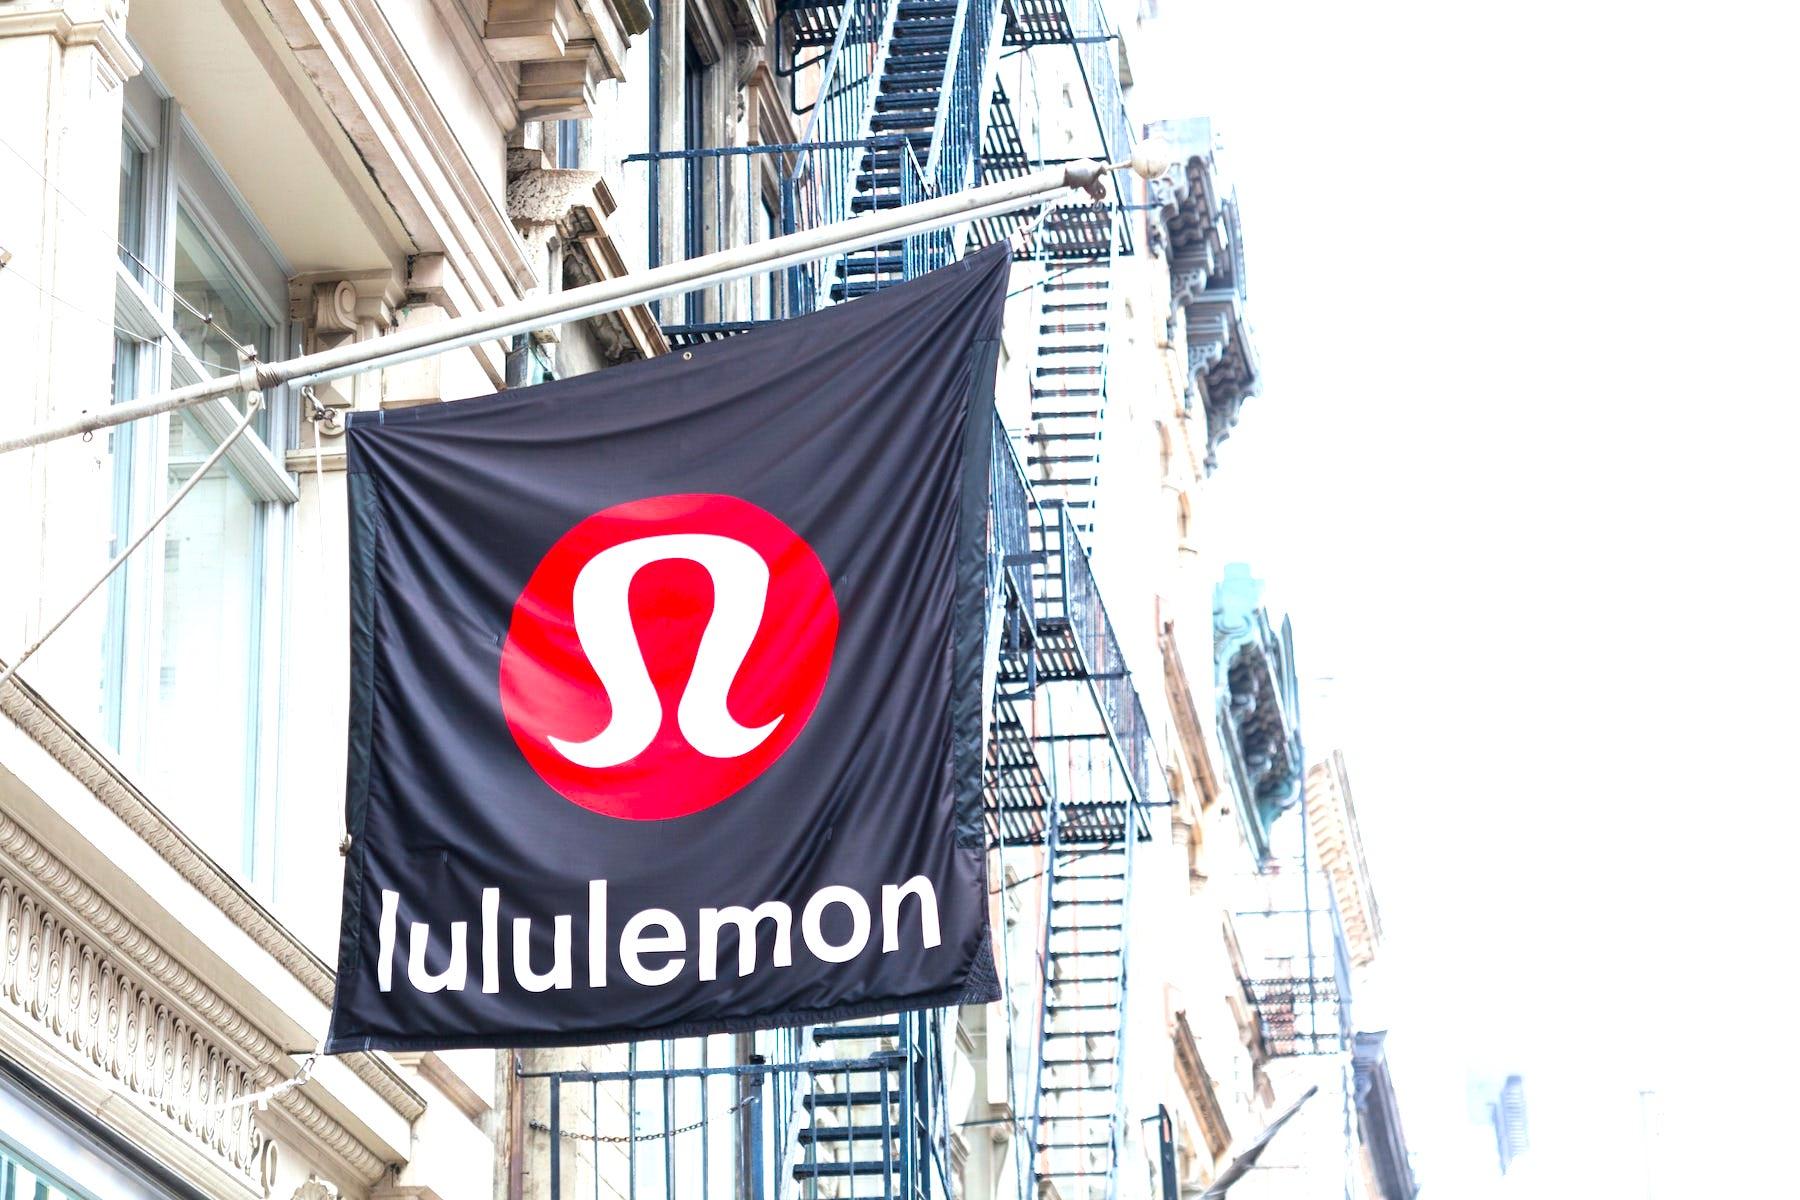 Lululemon to buy home fitness start-up Mirror for US$500 million